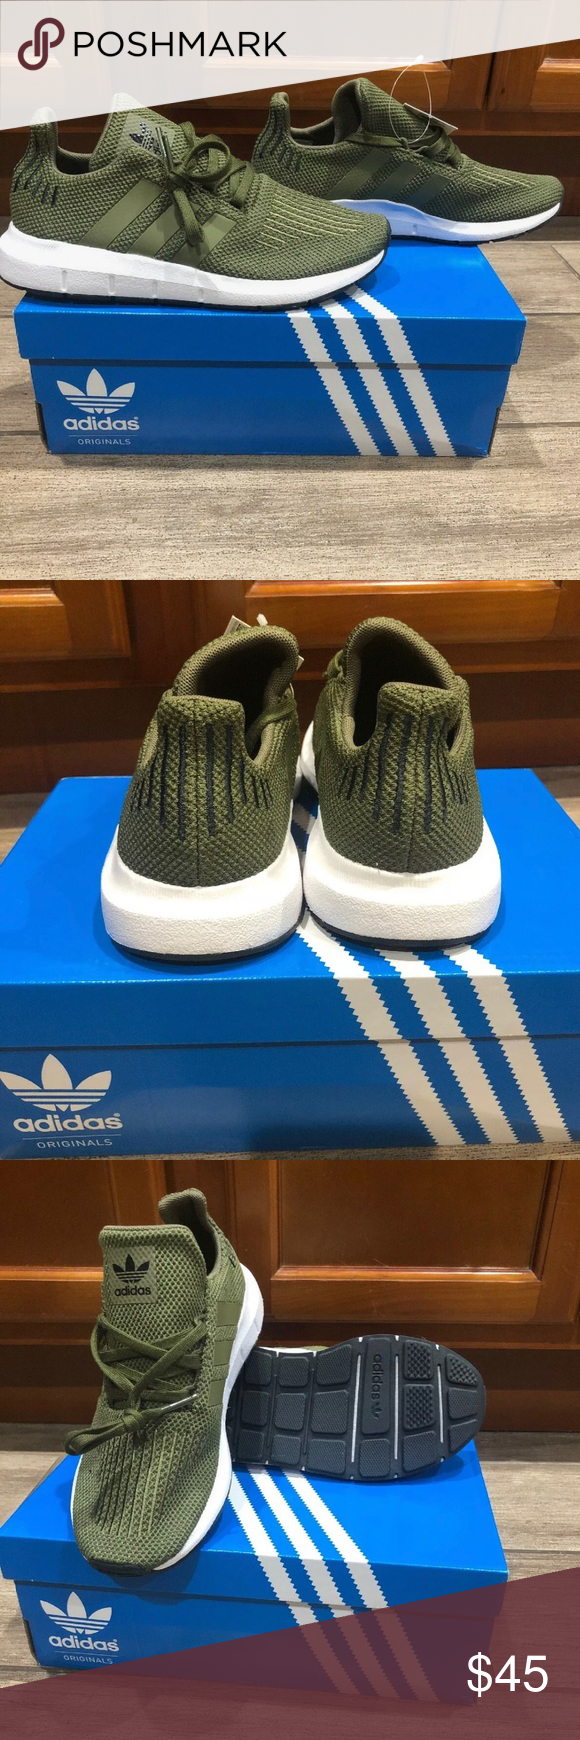 Kids shoes Adidas swift run boys